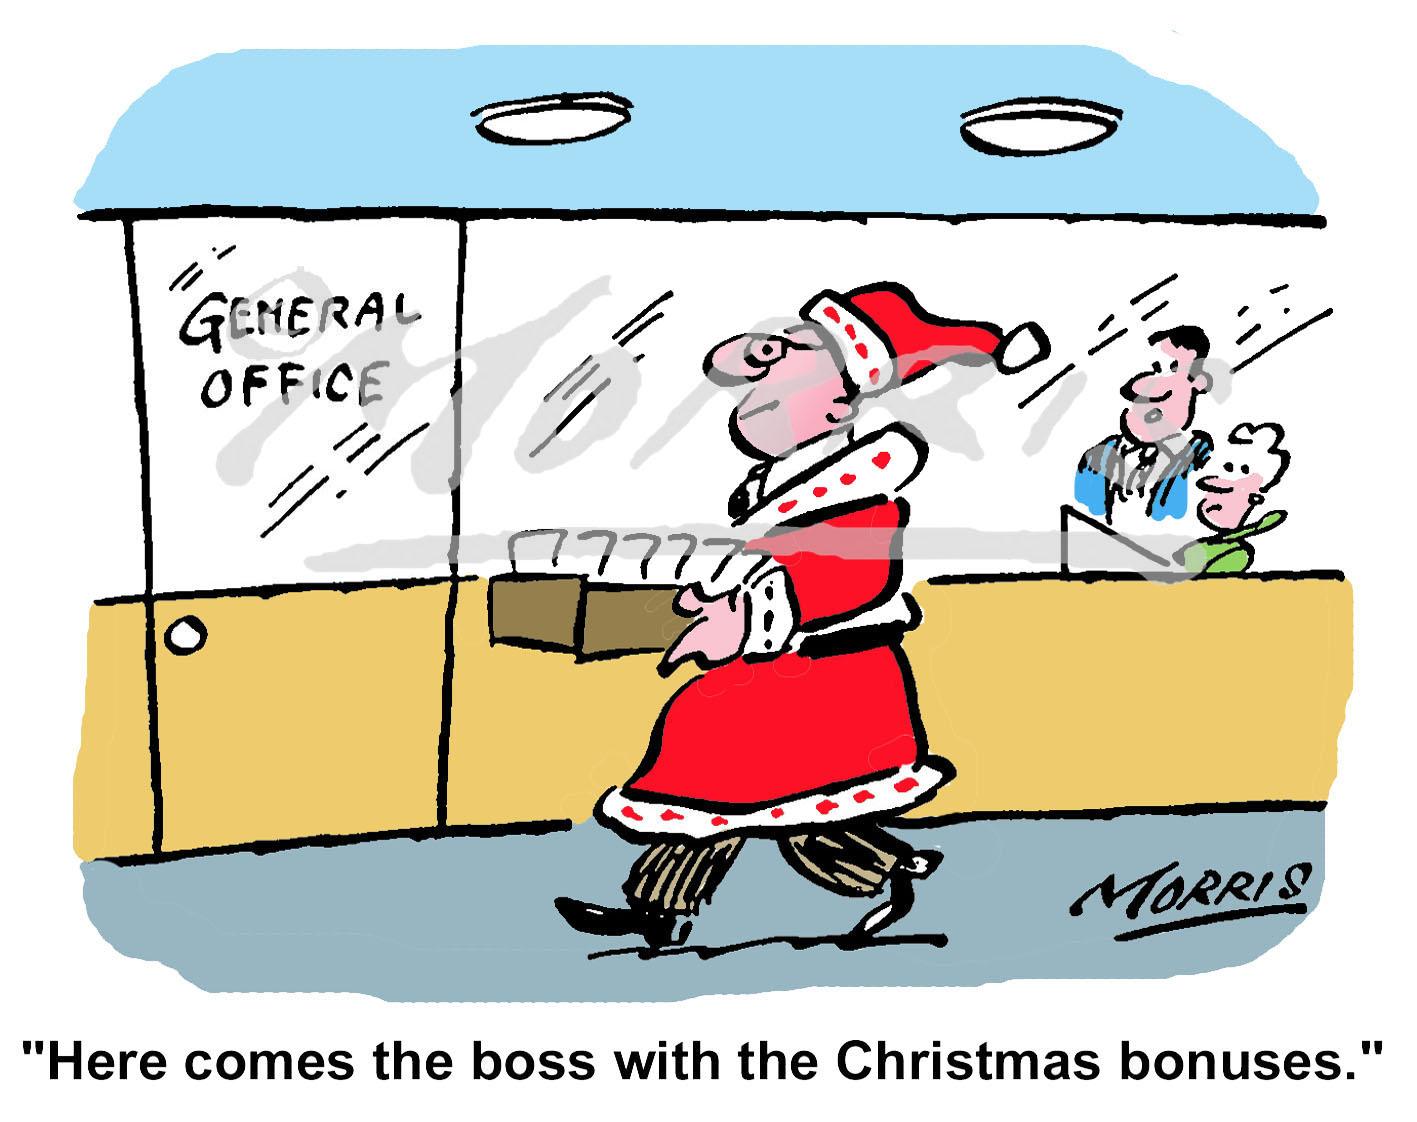 Office Manager Christmas bonus cartoon Ref: 0963col